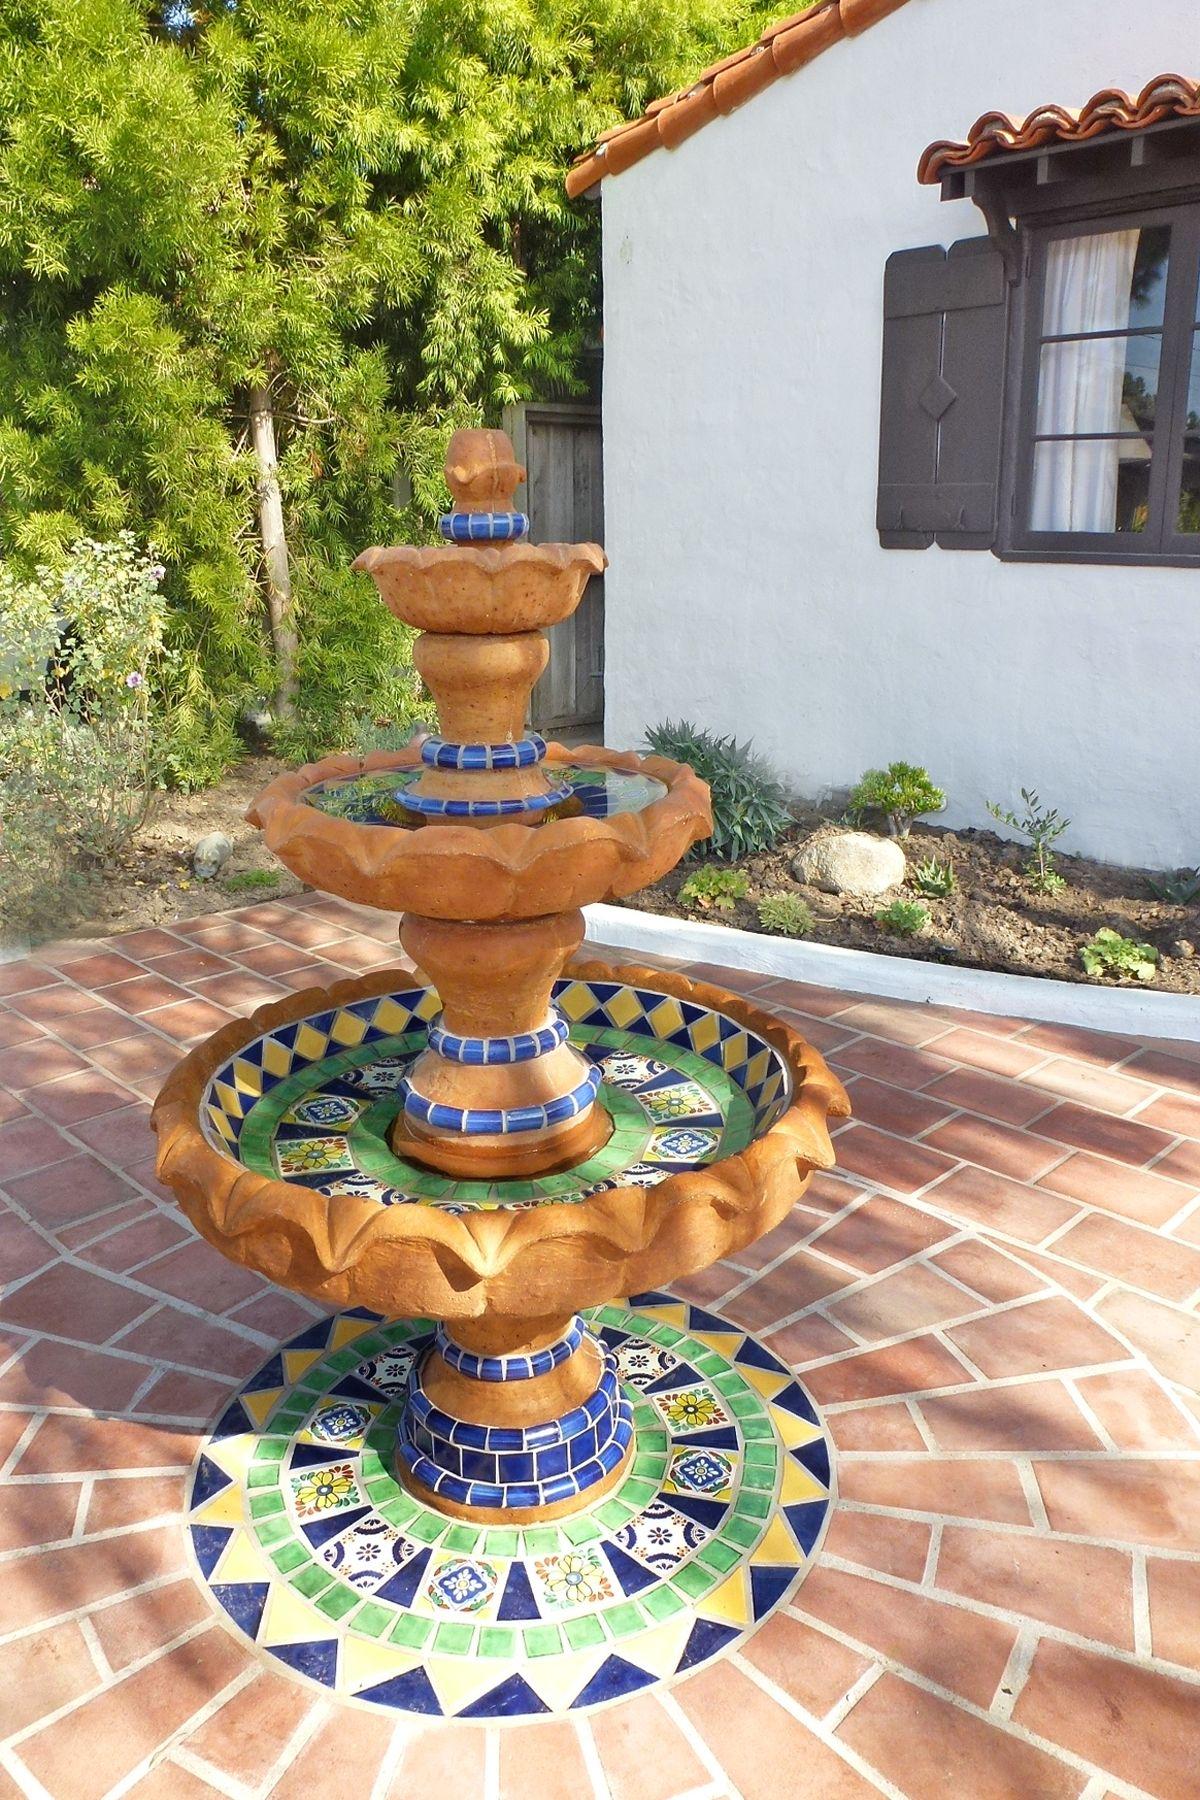 ole hanson historic home fountain design using using